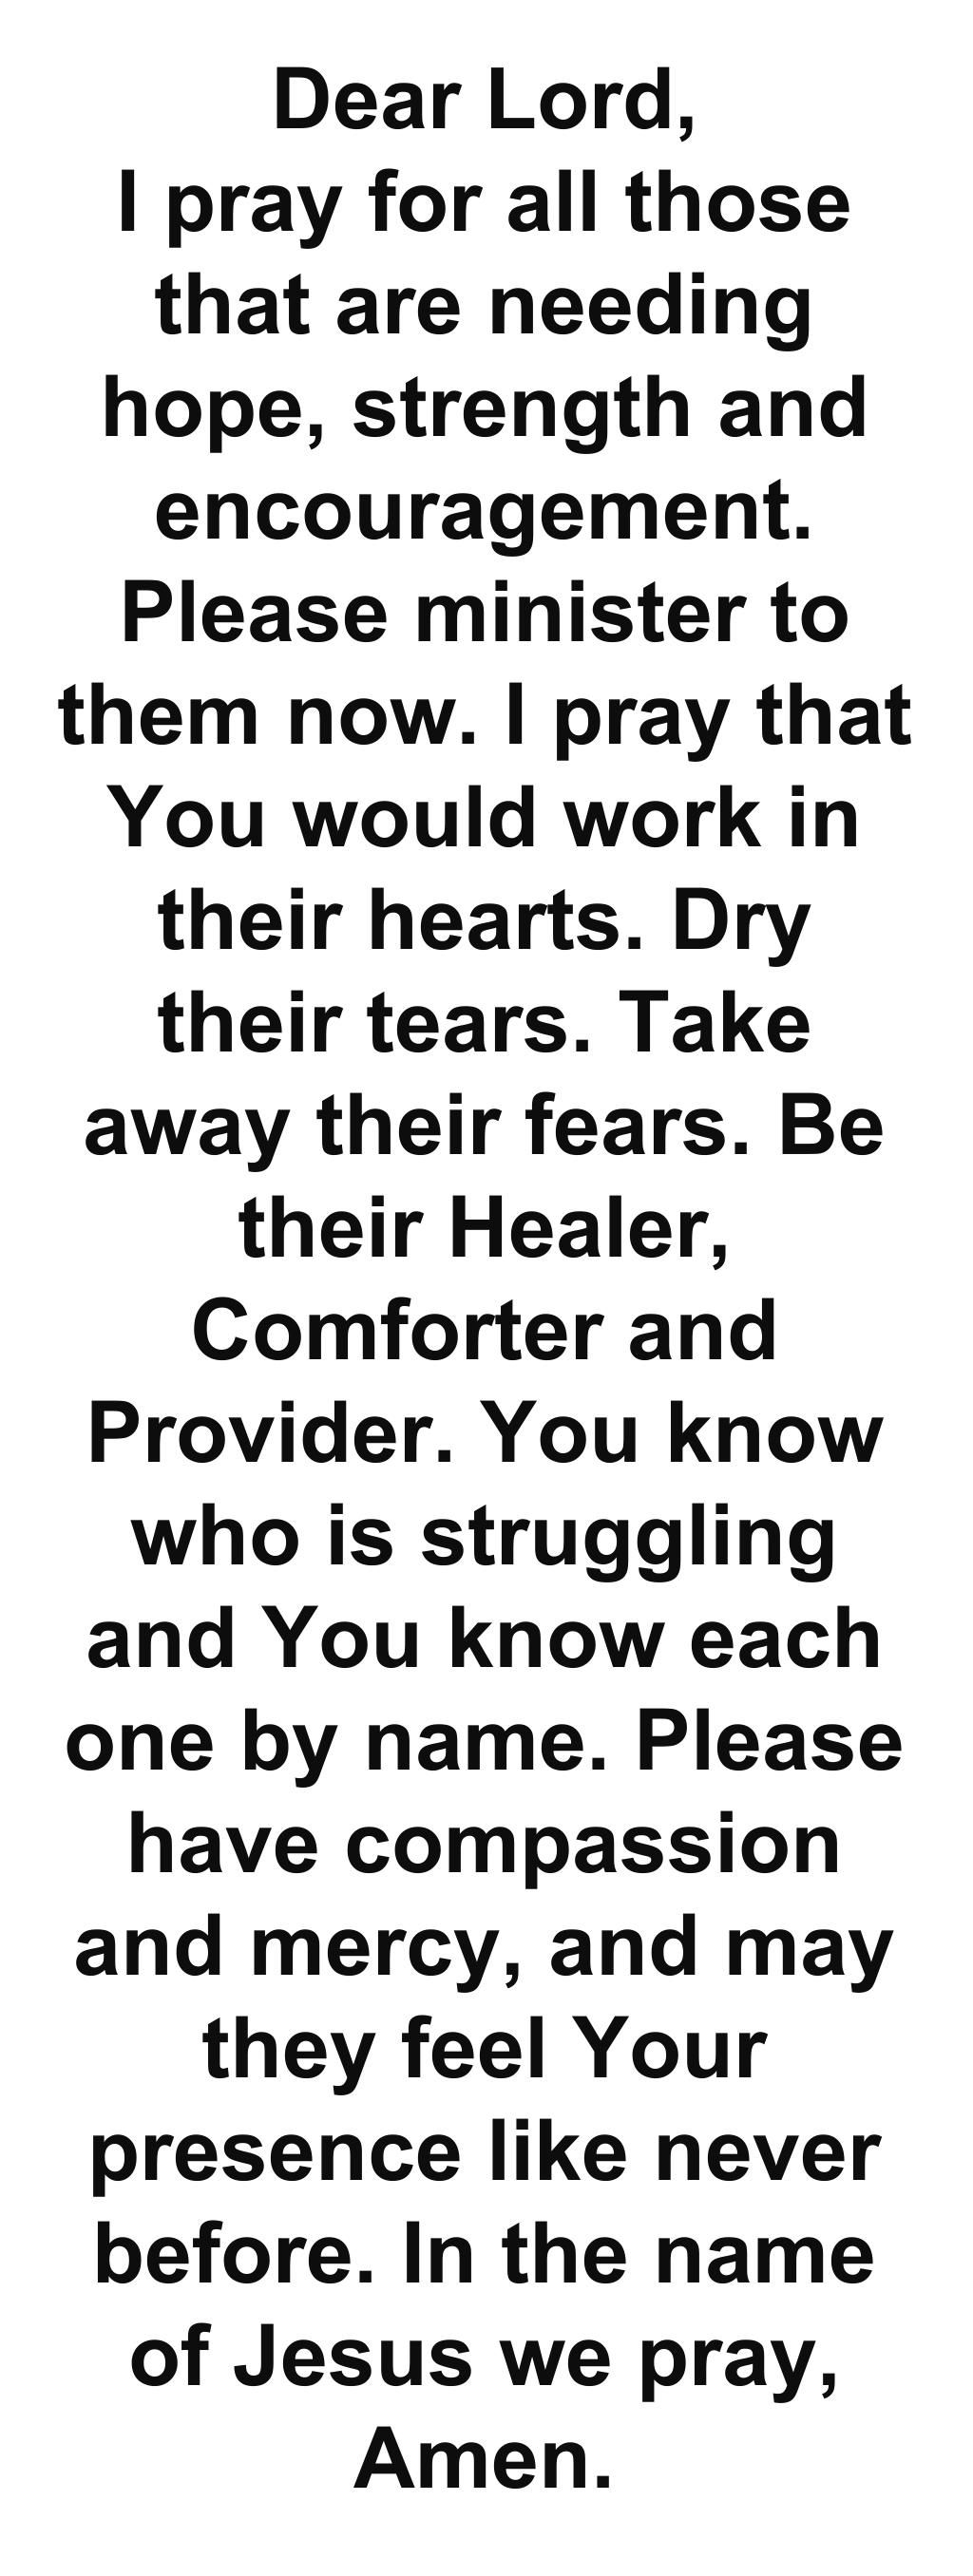 Catholic prayer for hope and healing